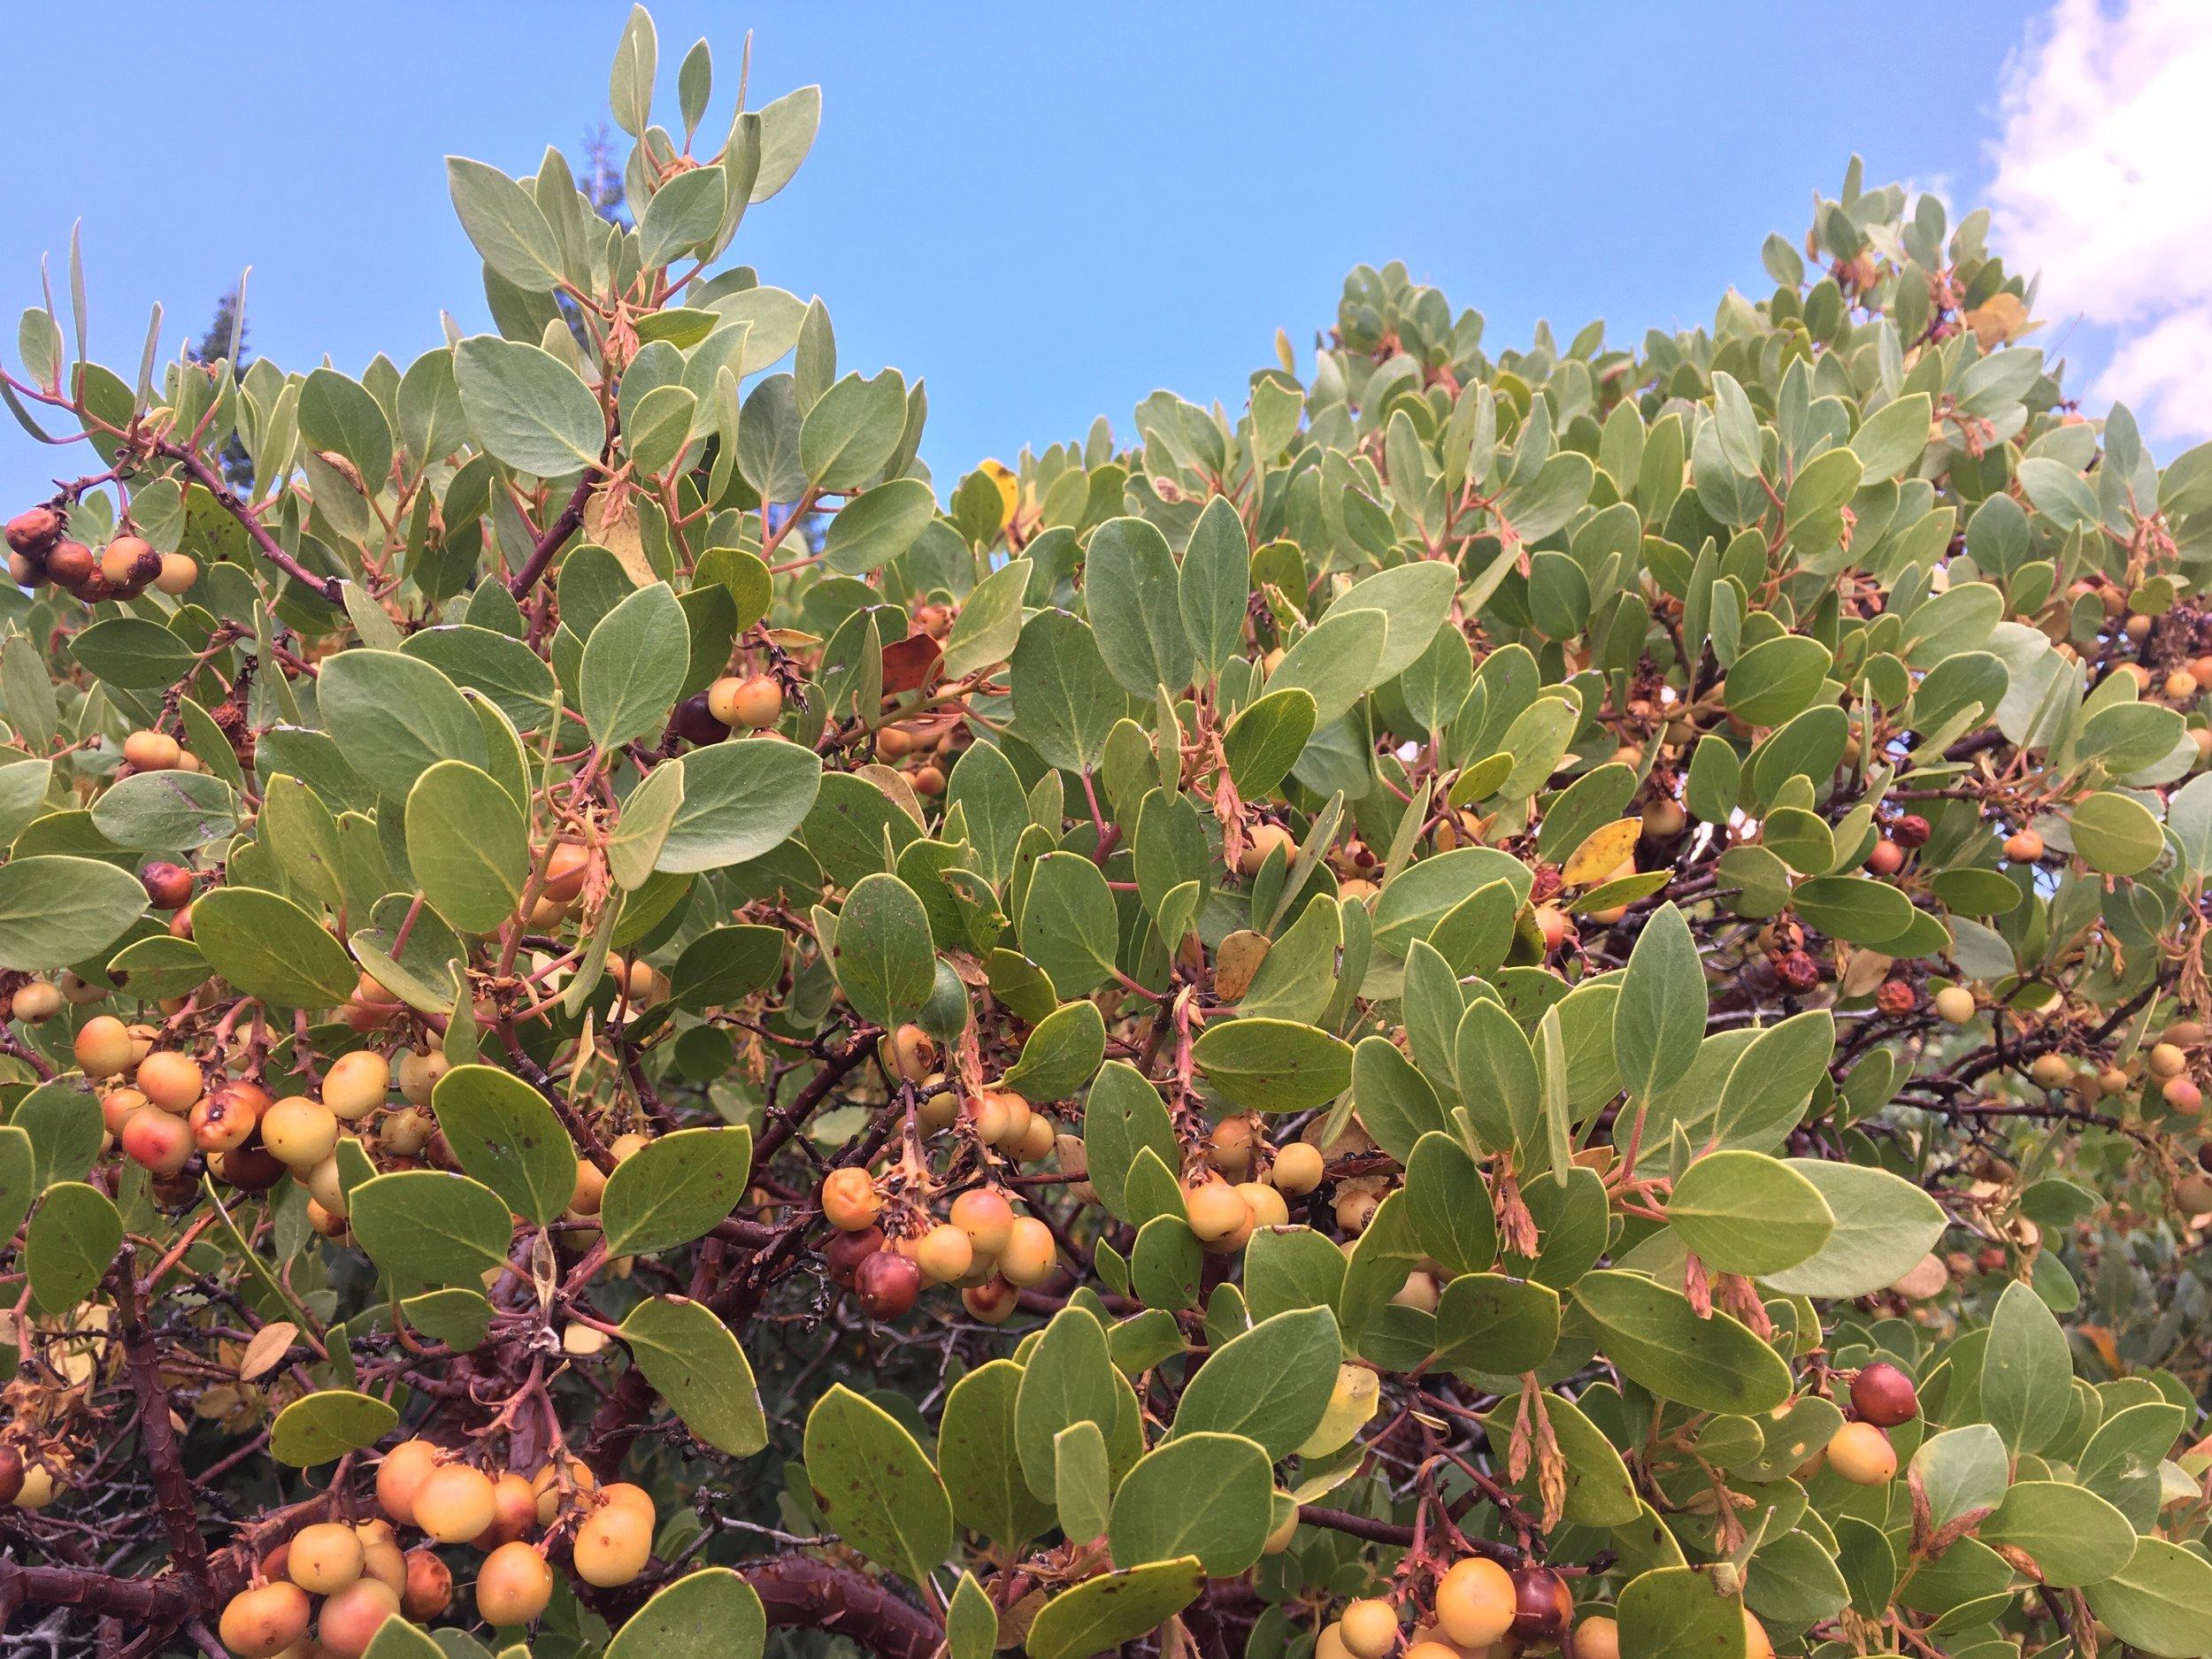 Manzanita berries aplenty along the trails.